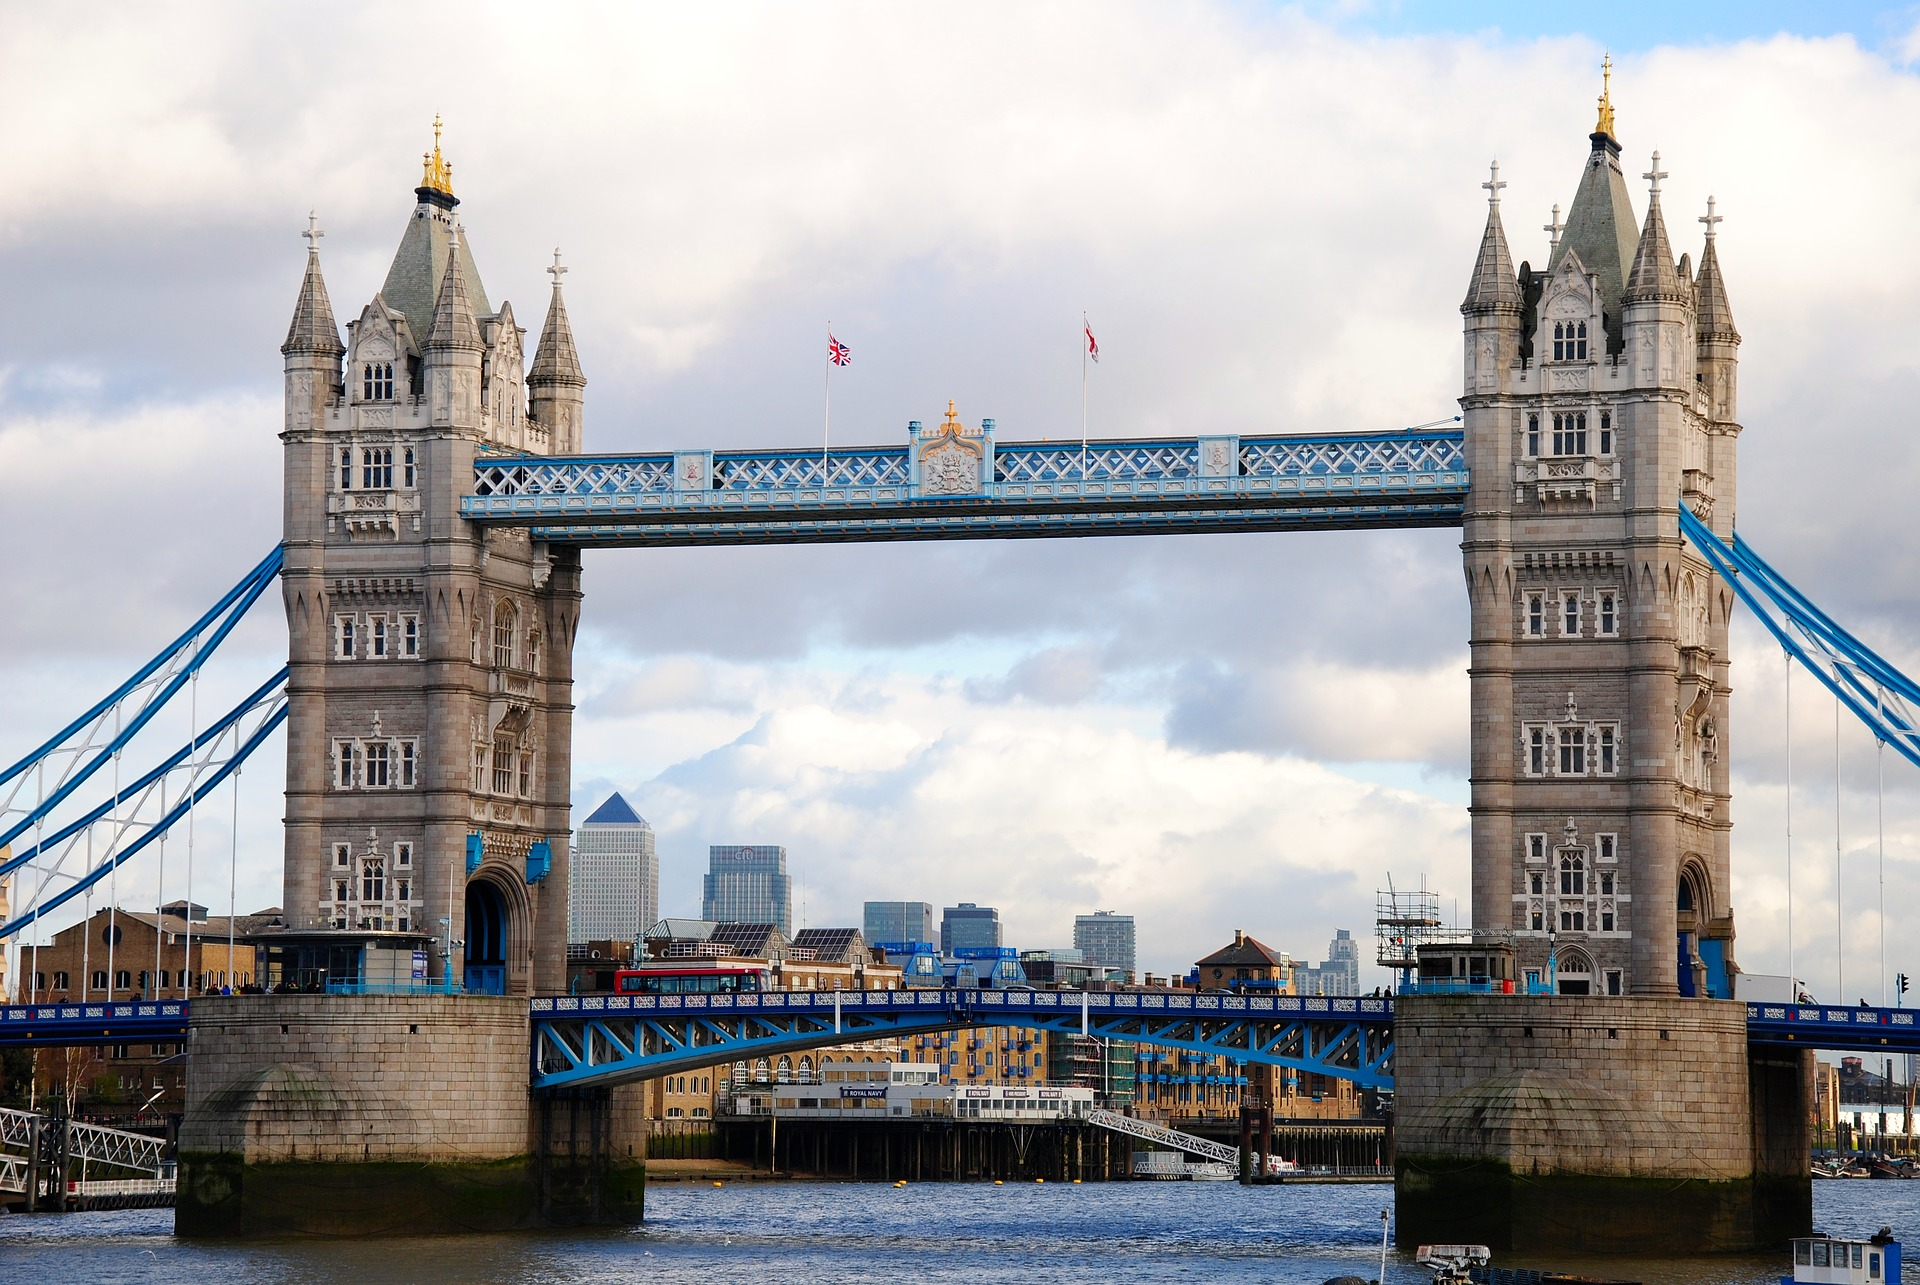 tower-bridge-1938684_1920